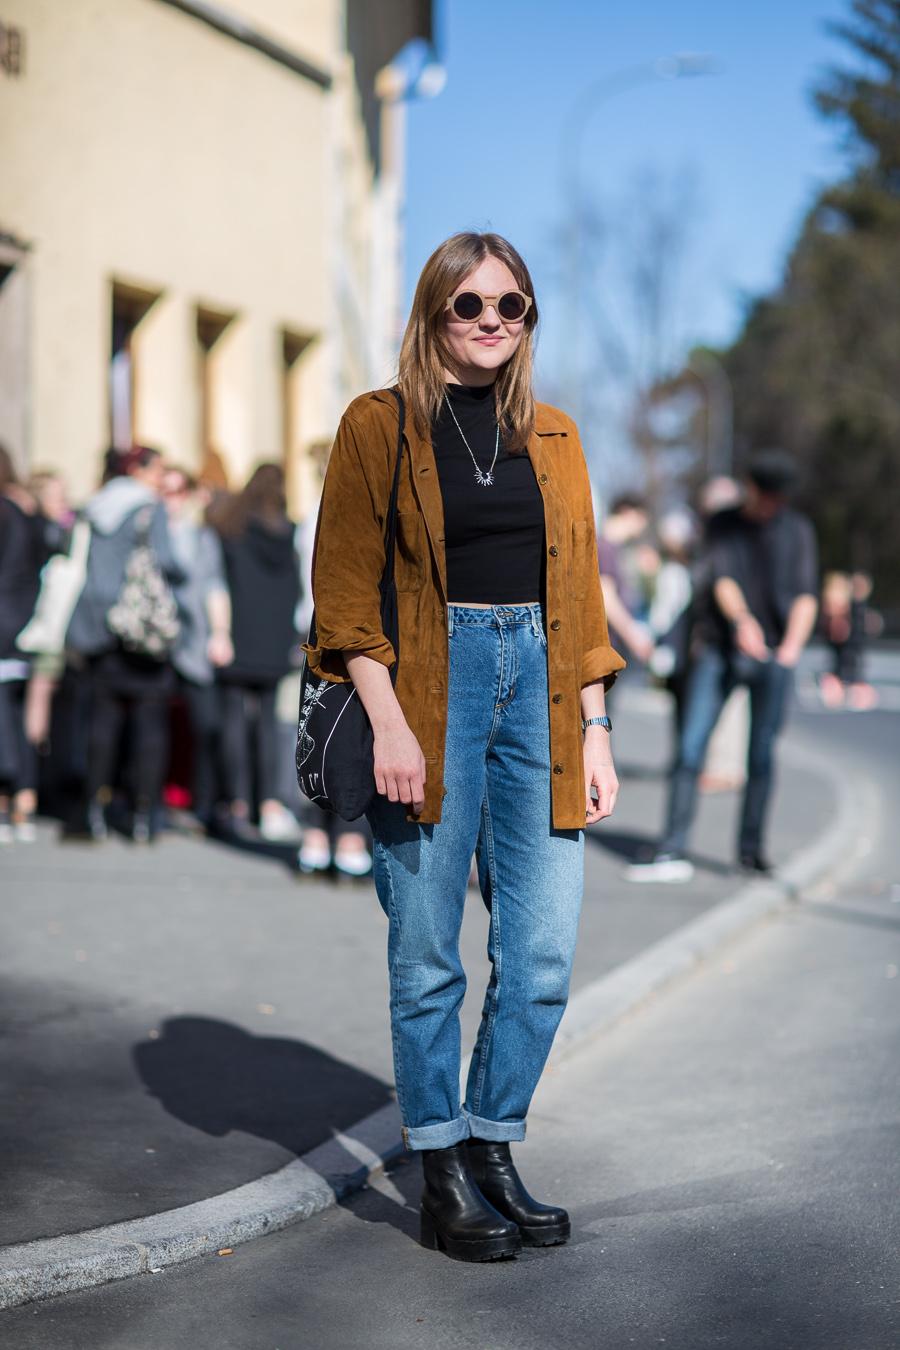 street-style-fashion-blog-innsbruck-vintage-markt-9.jpg